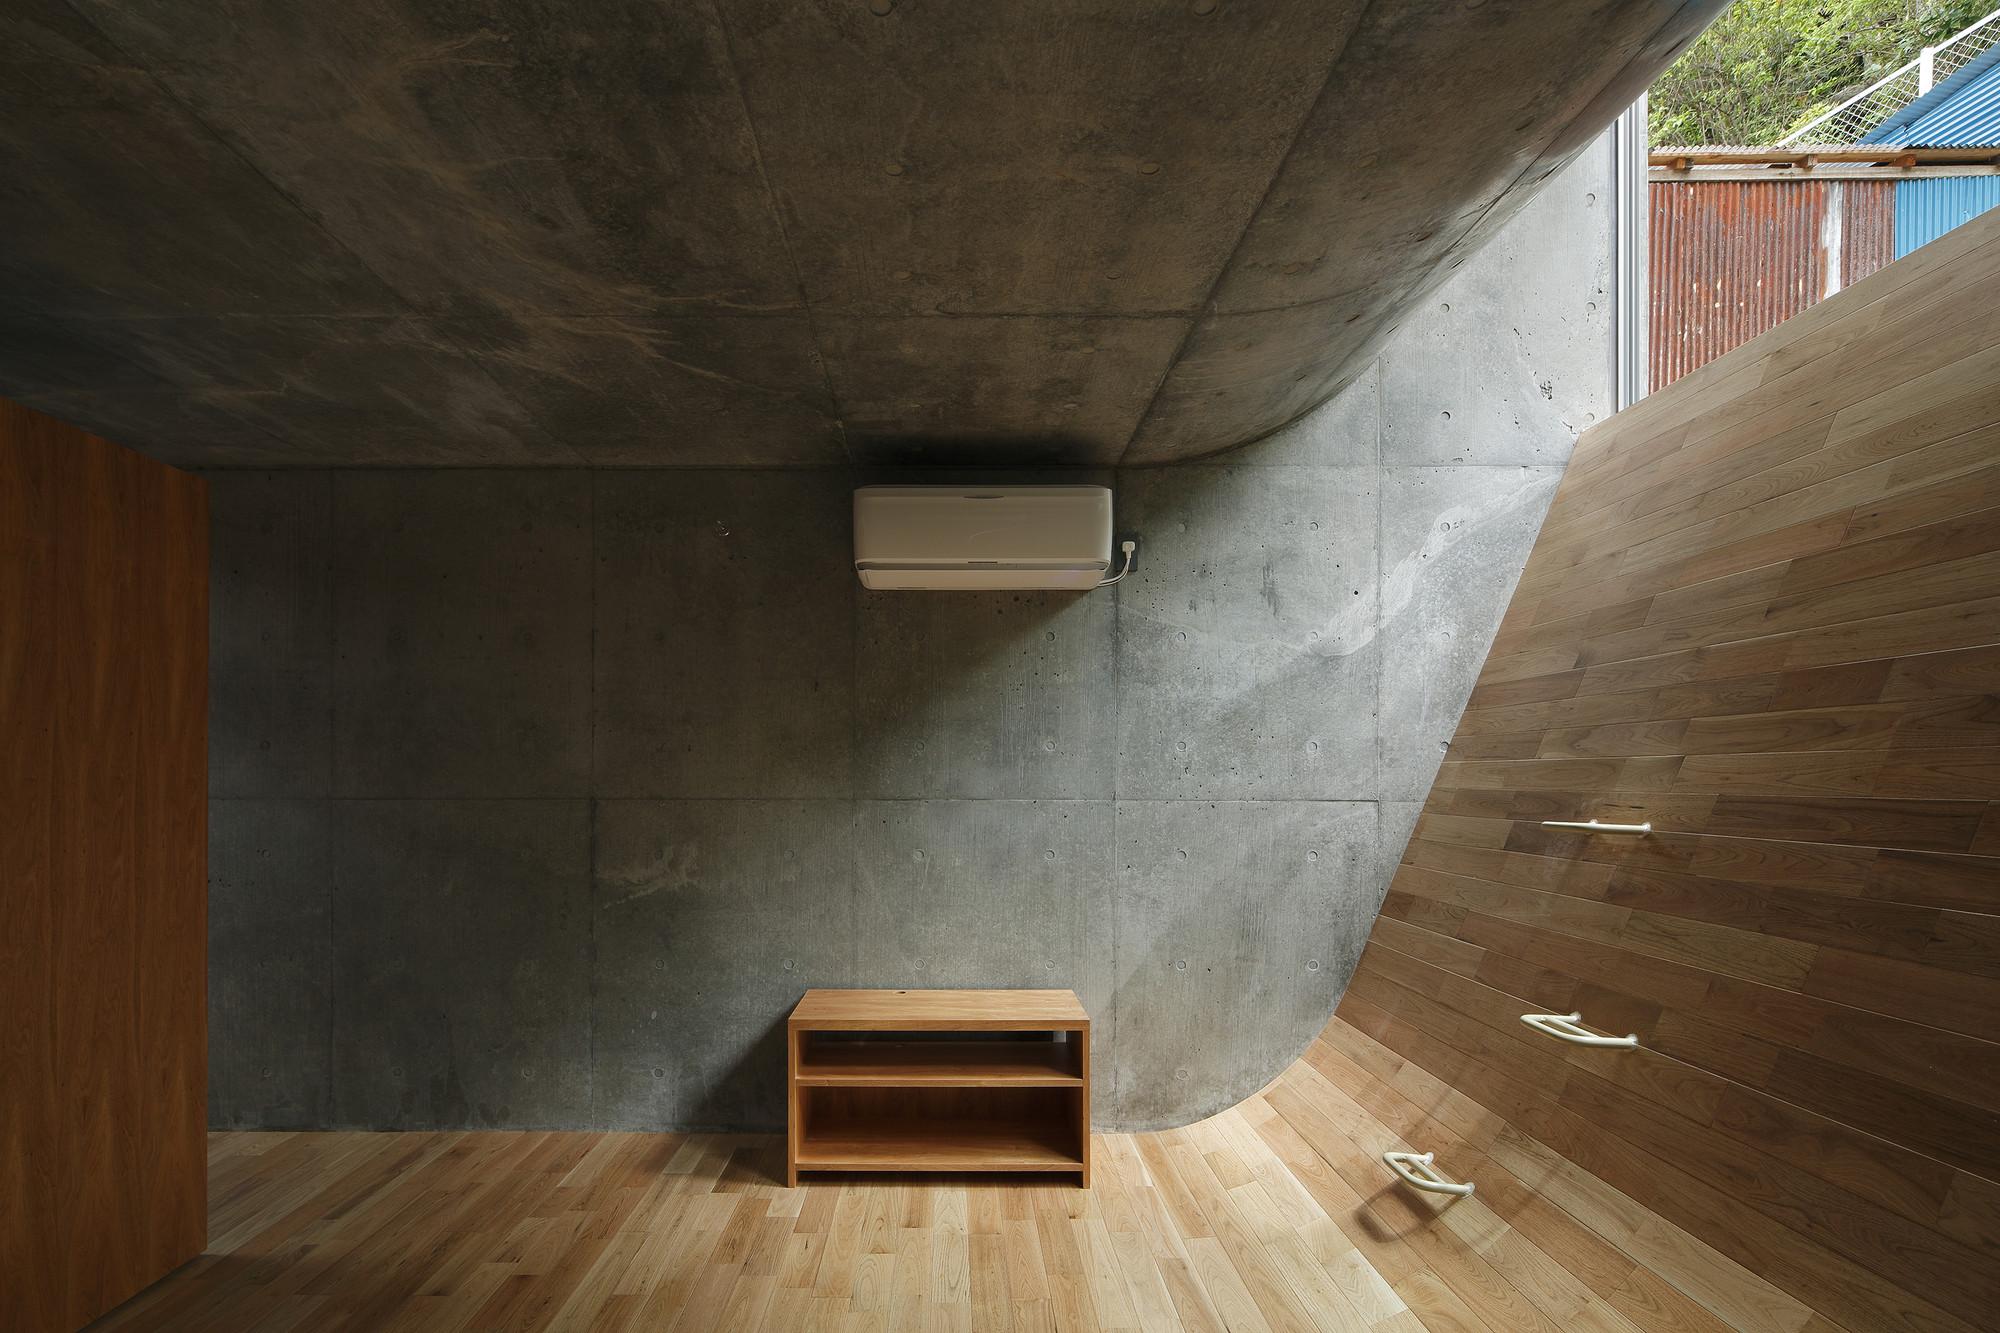 Gallery Of House In Byoubugaura Takeshi Hosaka 3